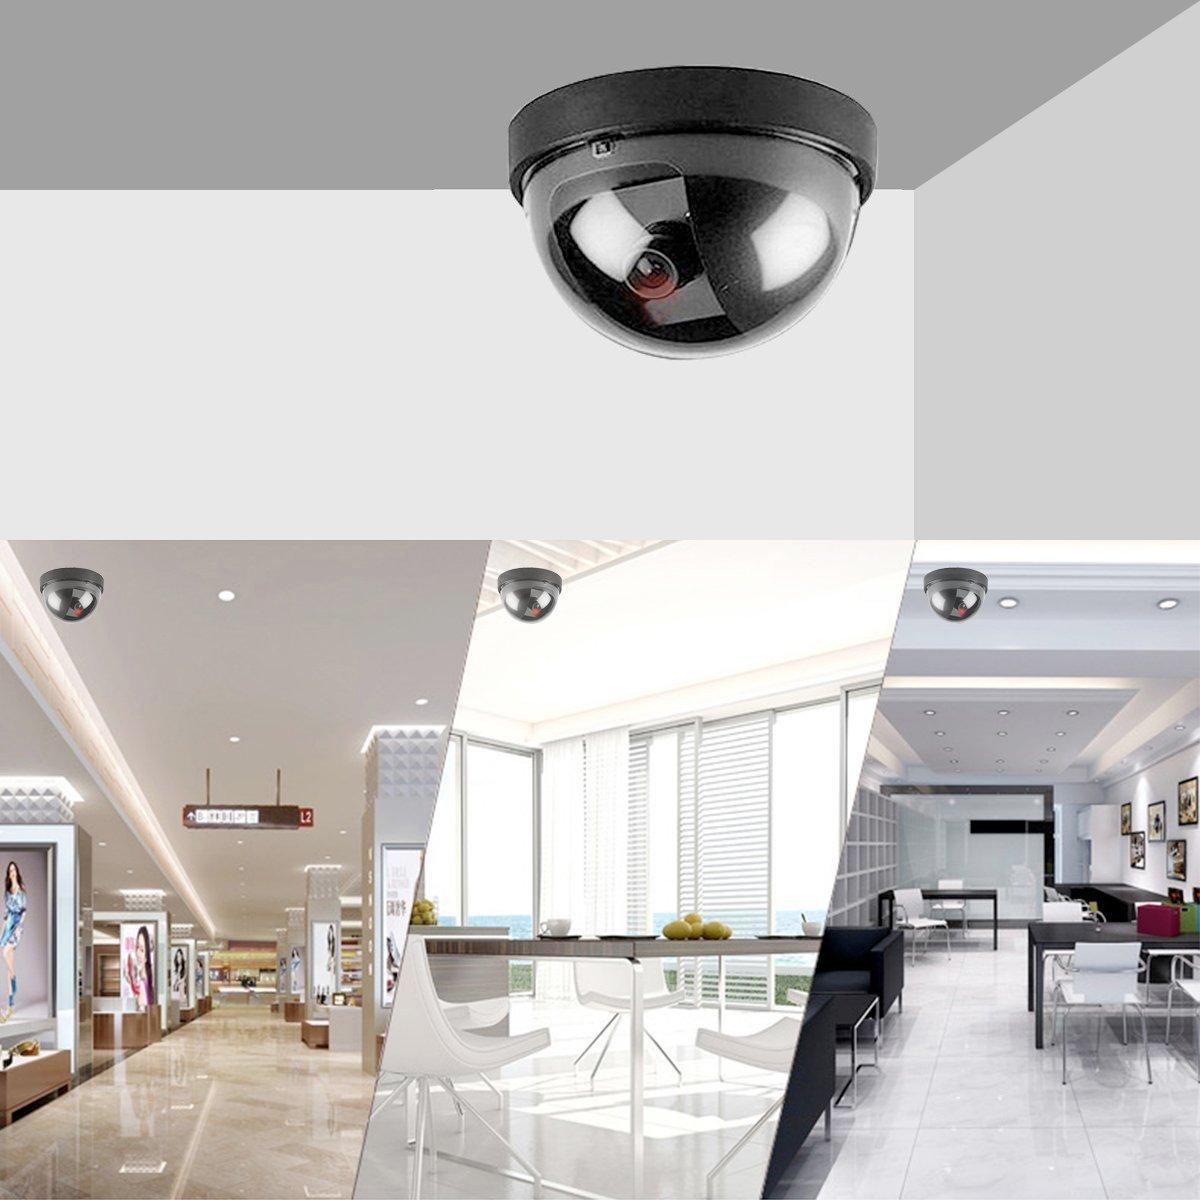 Maxesla 4 Pieza Cámara Falsa Dummy Cámara de Seguridad Vigilancia Falsa LED Parpadeante Inalámbrico Impermeable Sistema de Vigilancia Cámara Simulada CCTV ...